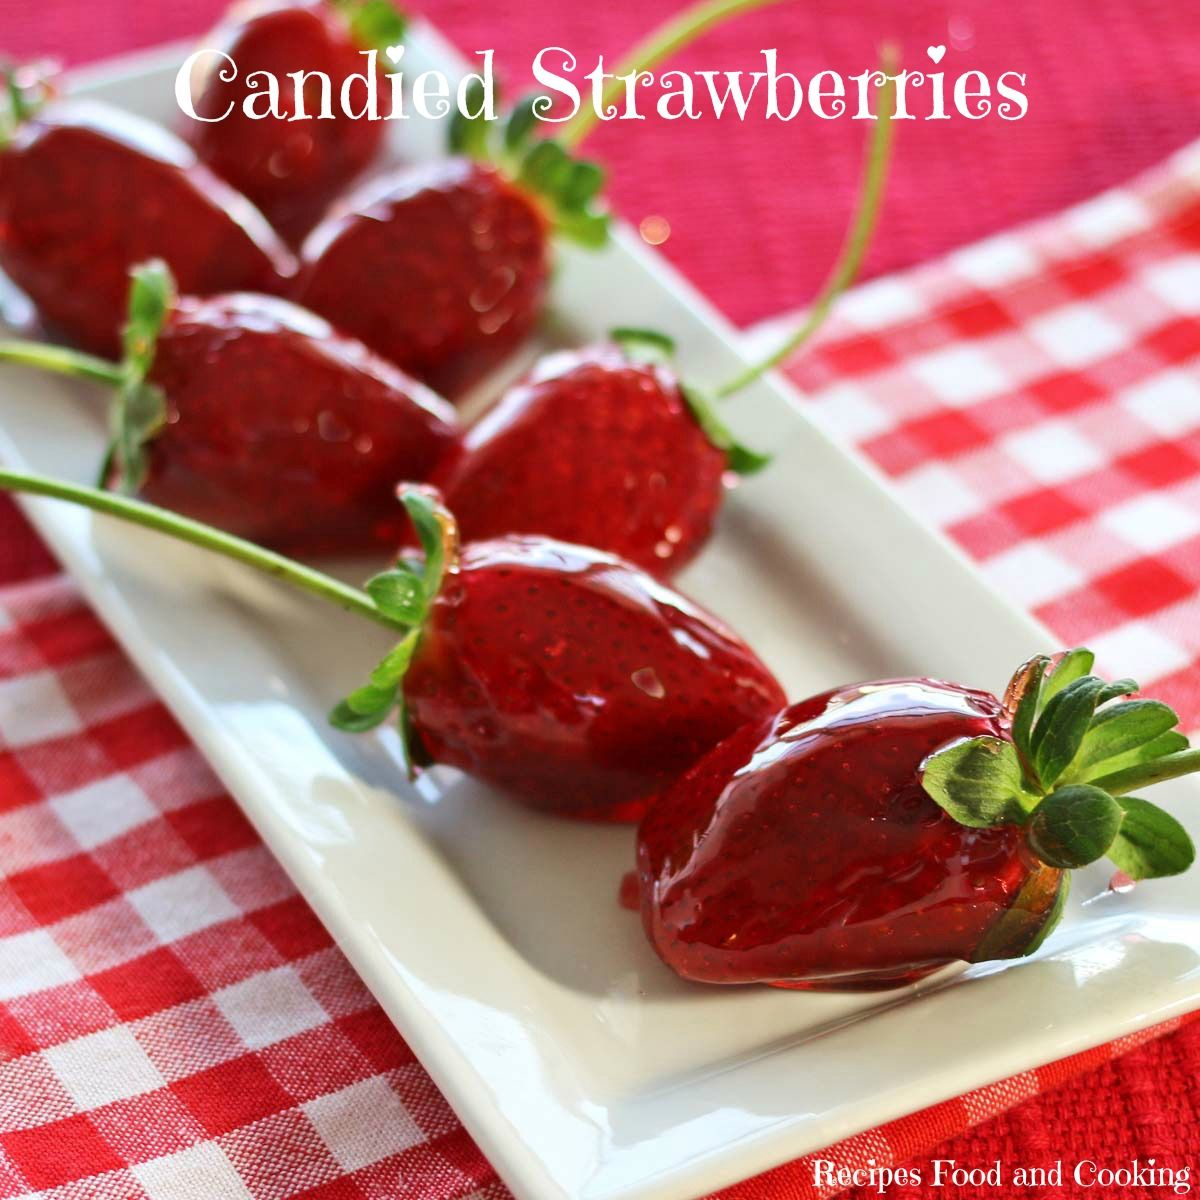 Candied Strawberries Recipe Chocolate strawberries